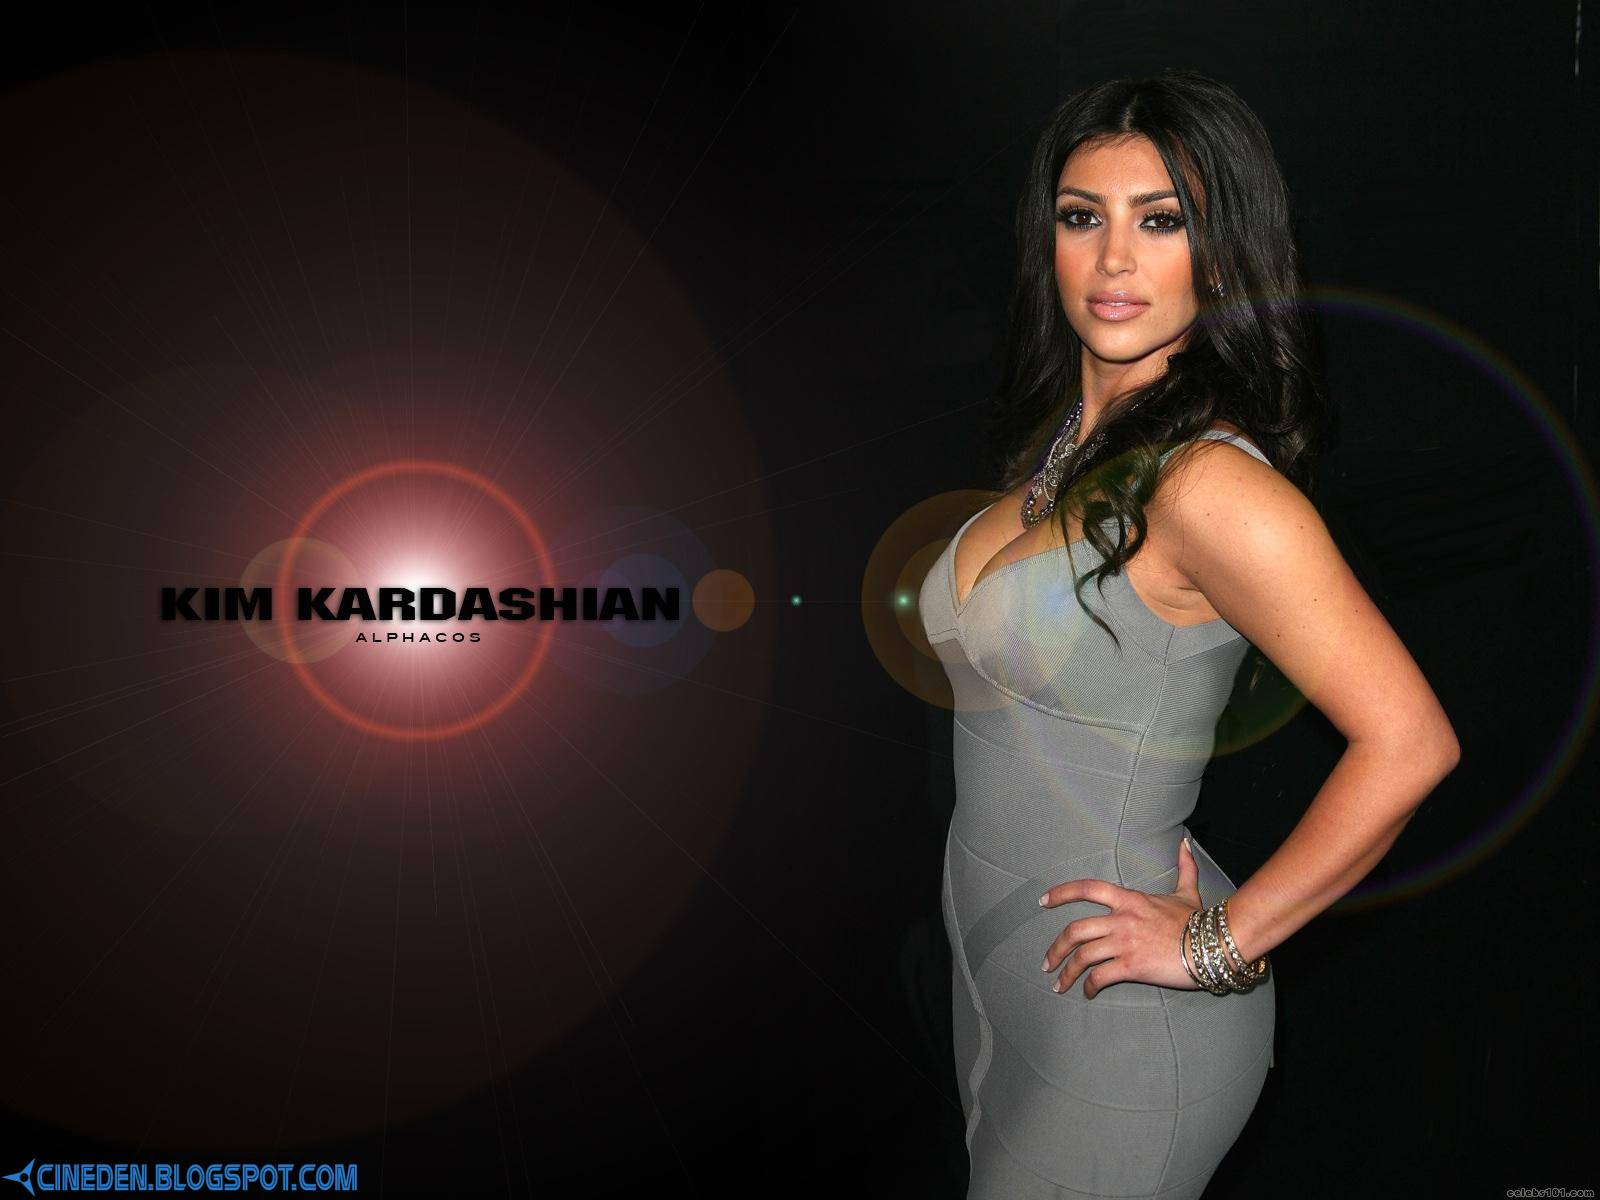 Kim Kardashian calls herself hypocrite